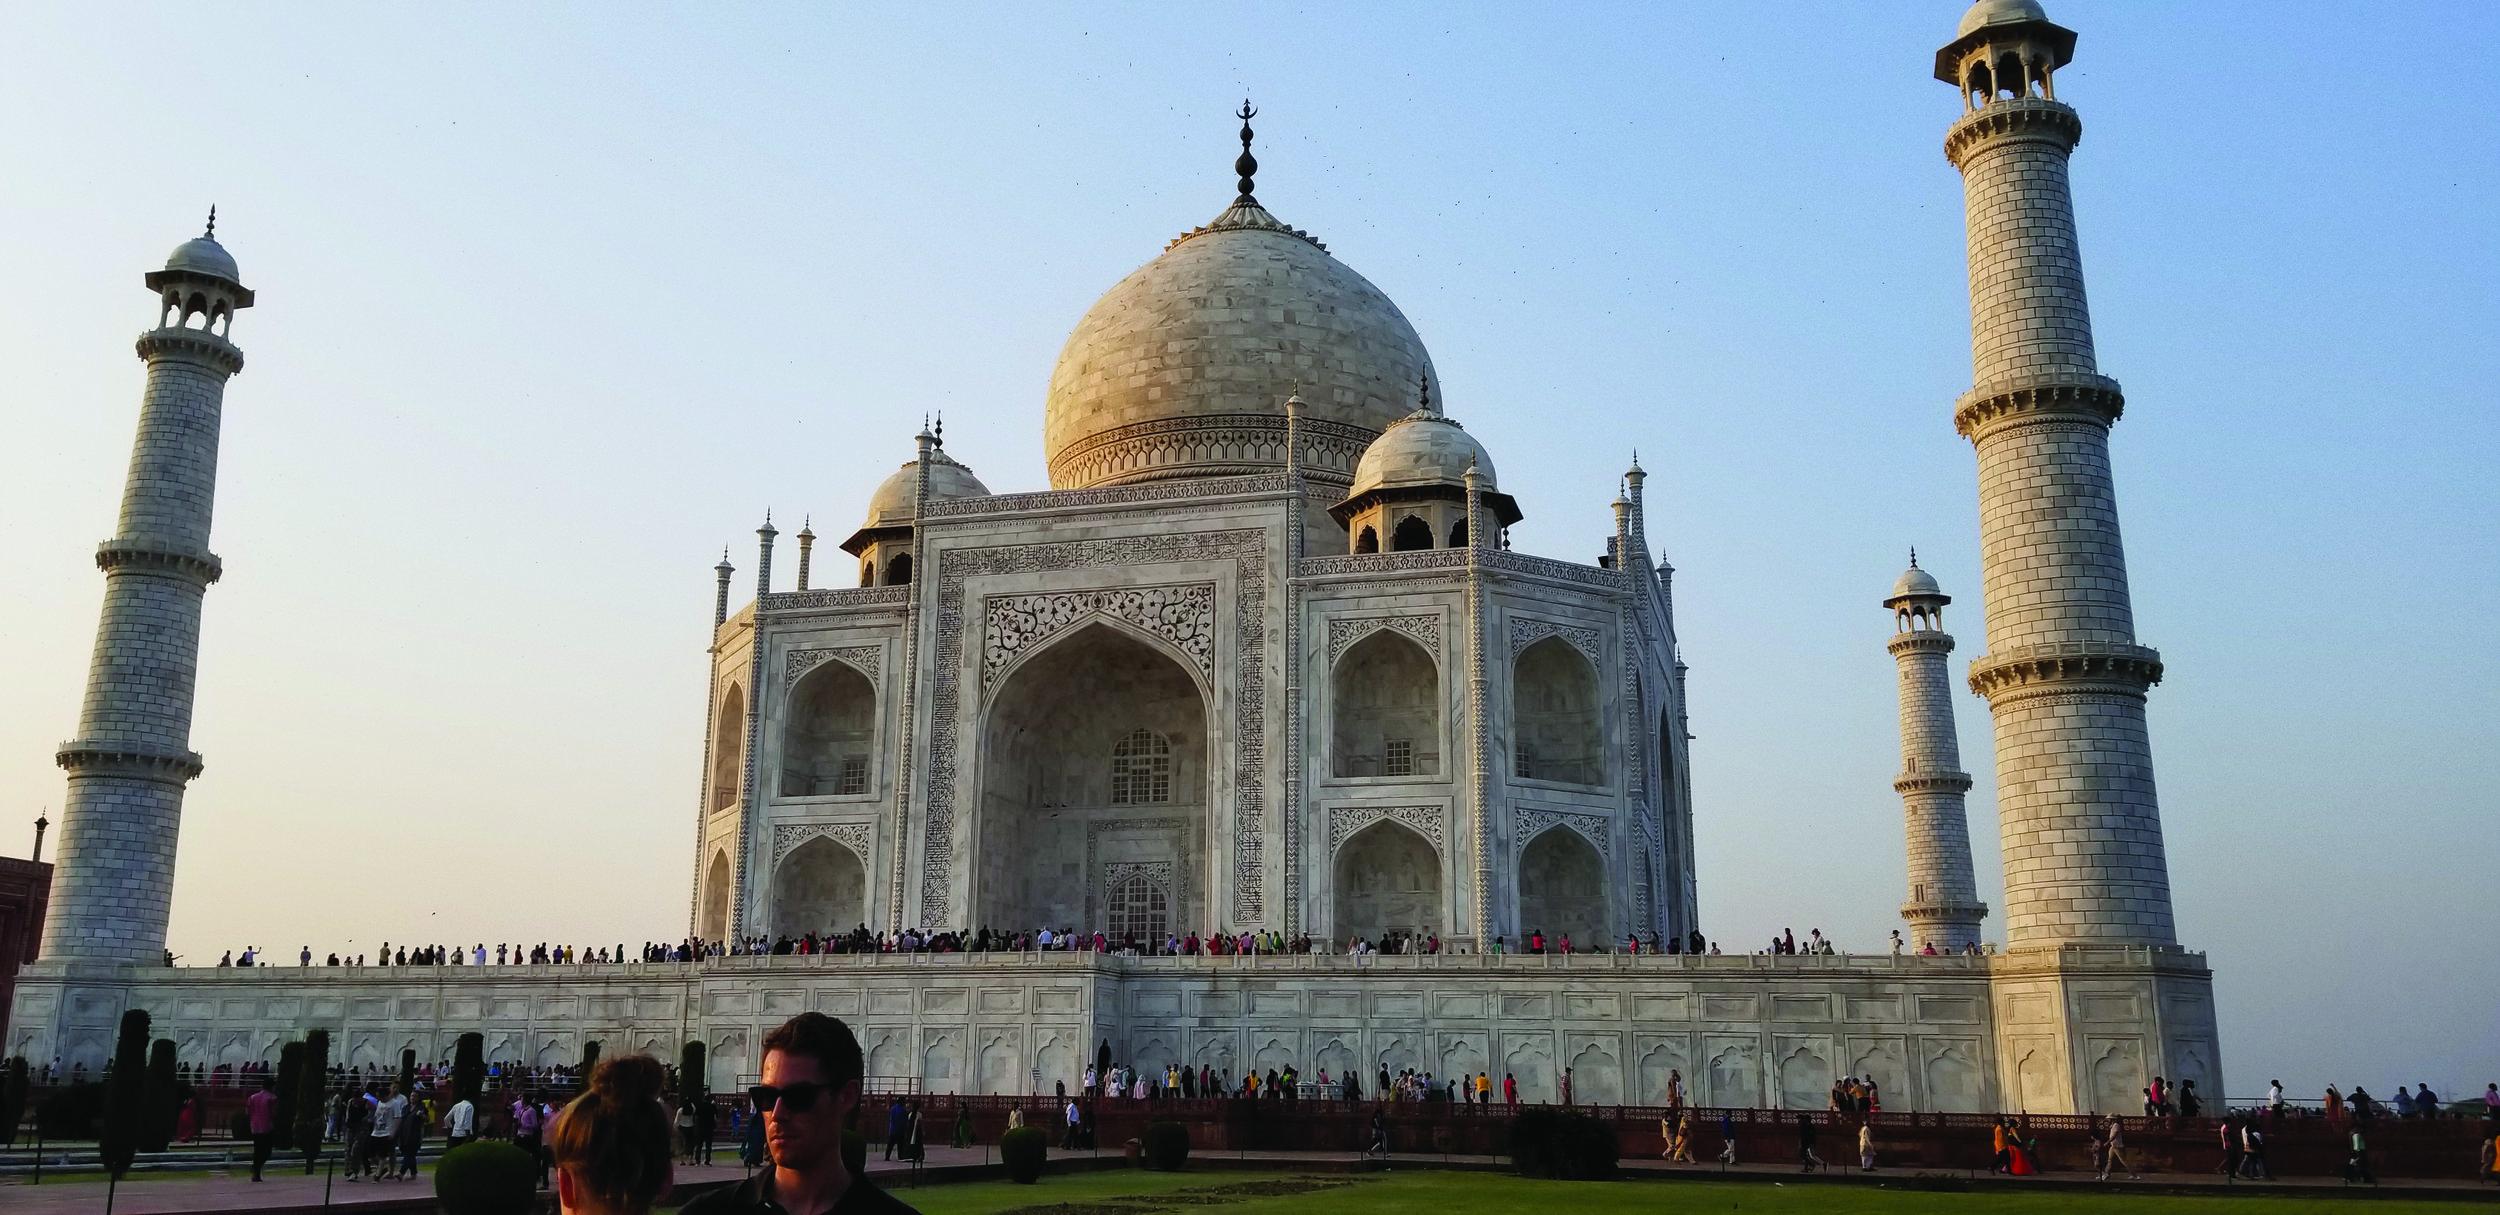 Amazing India - Arts & DelightsWritten by Tiffany Bowne